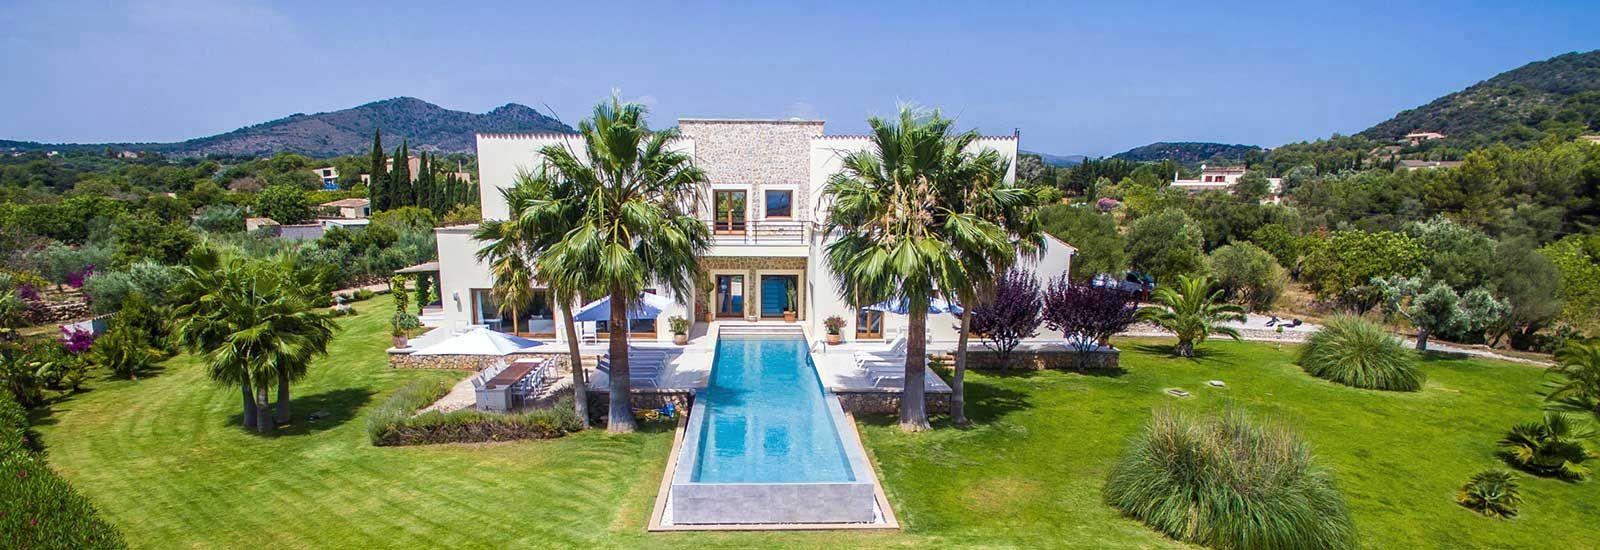 ferienhaus mallorca mieten mit pool (With images